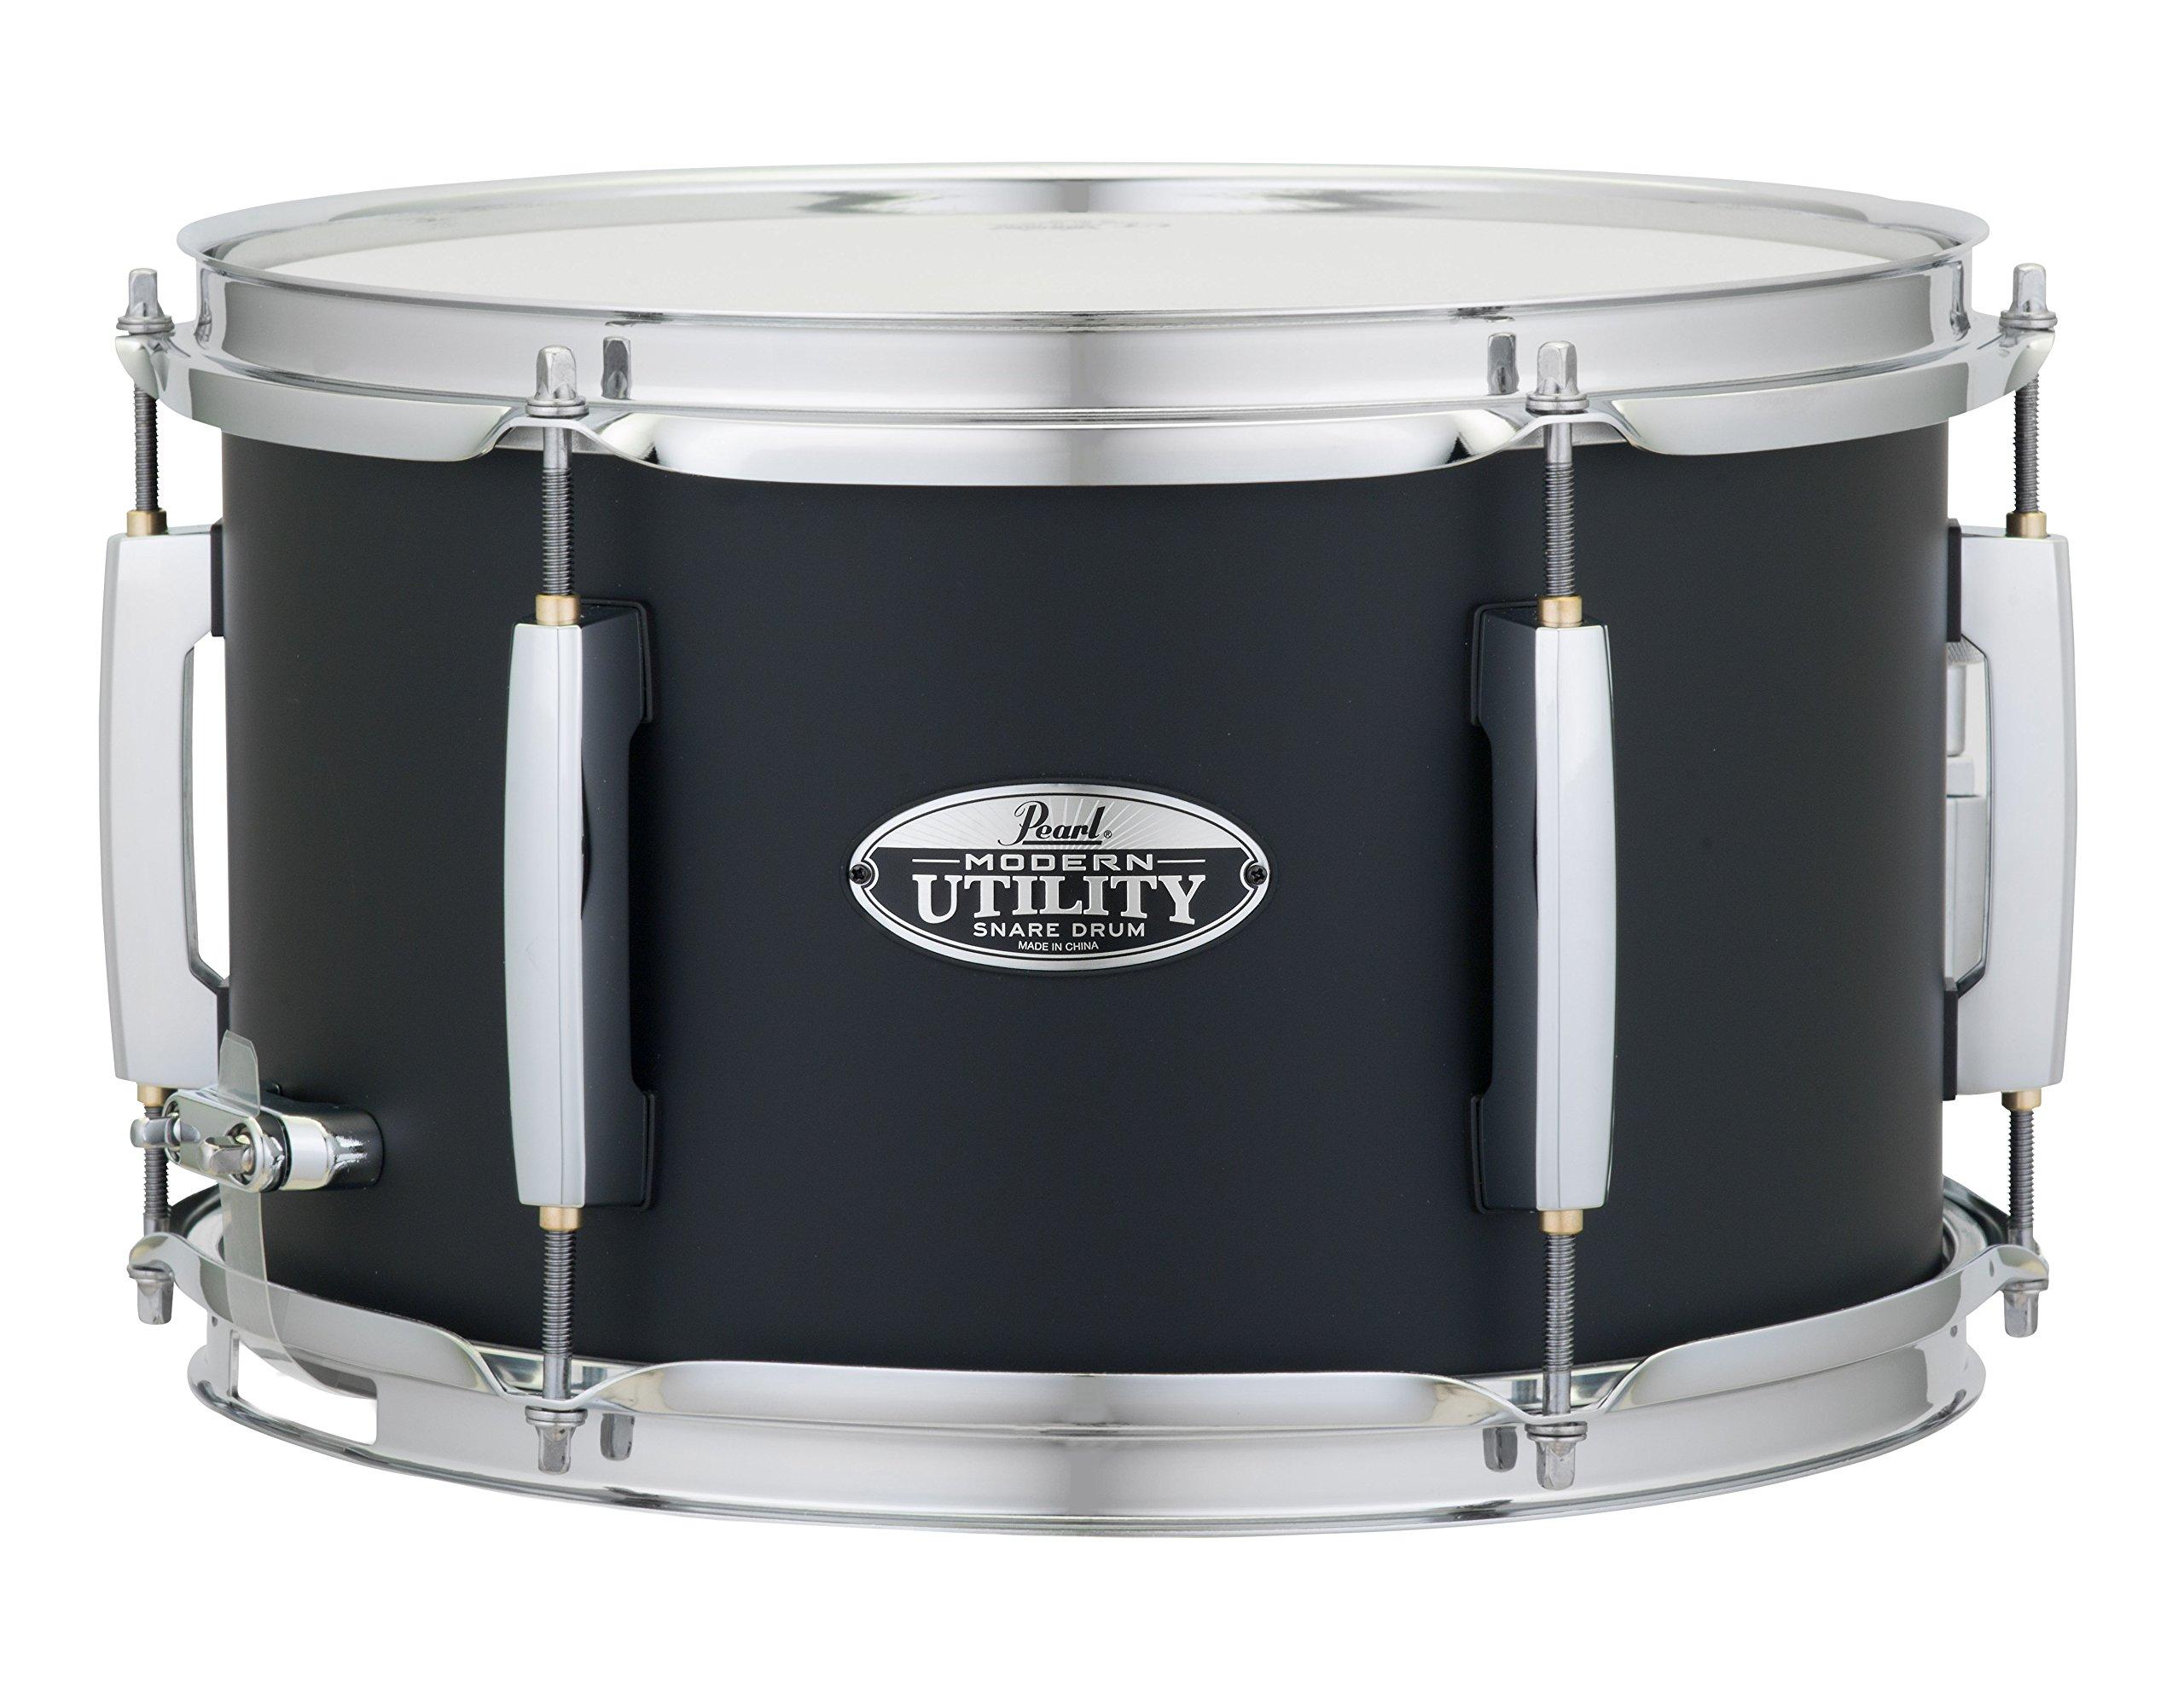 Pearl Snare Drum, Satin Black (MUS1270M227)